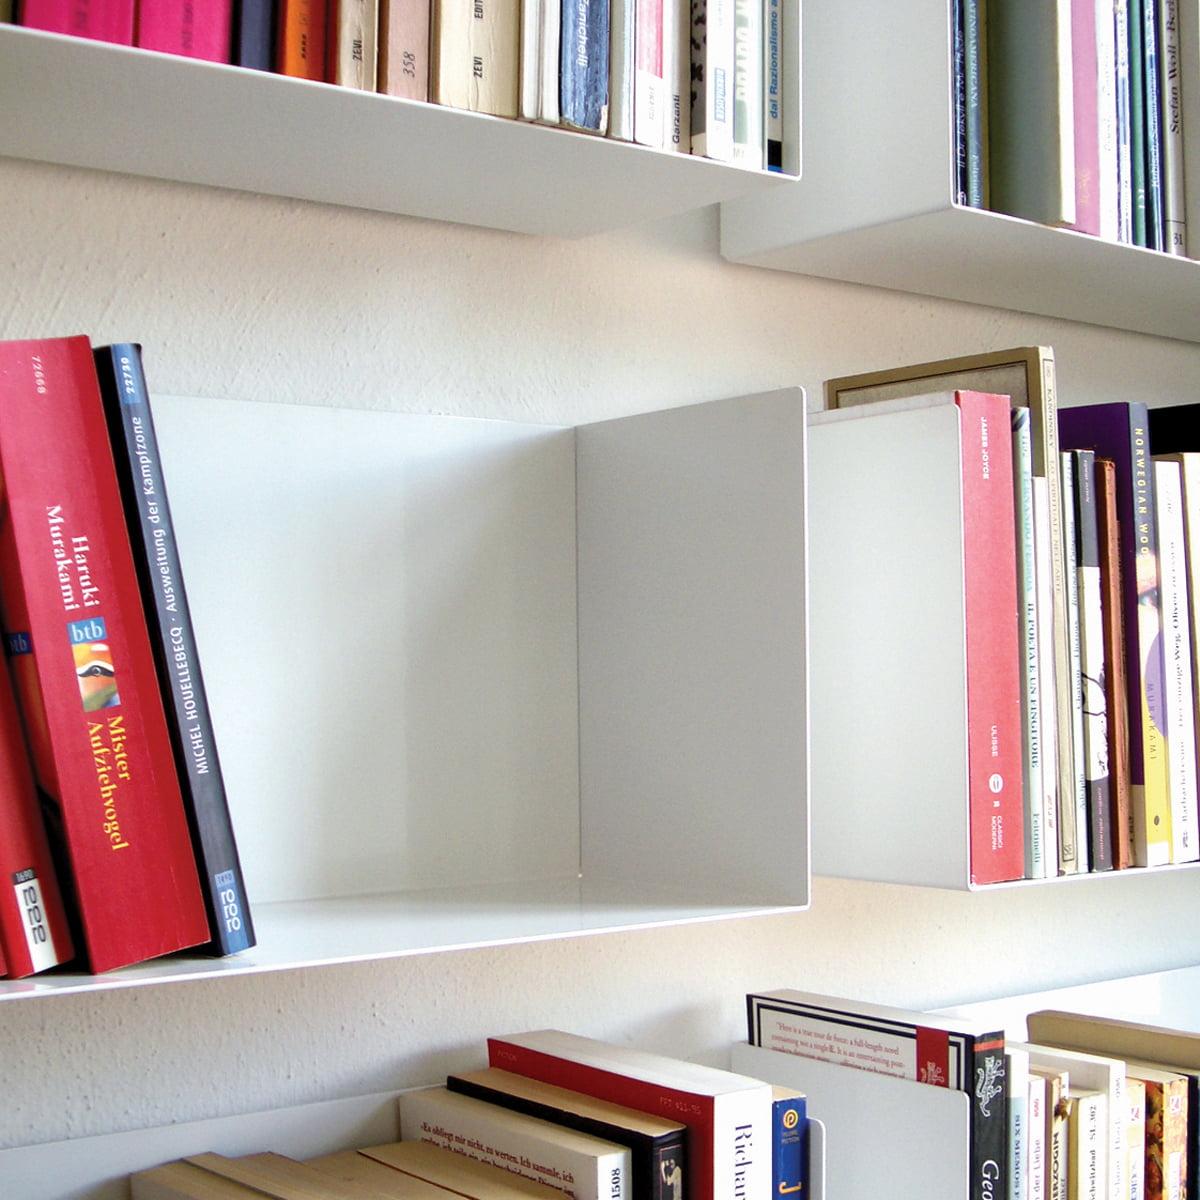 linea1 a b cher und dvd regal im shop. Black Bedroom Furniture Sets. Home Design Ideas